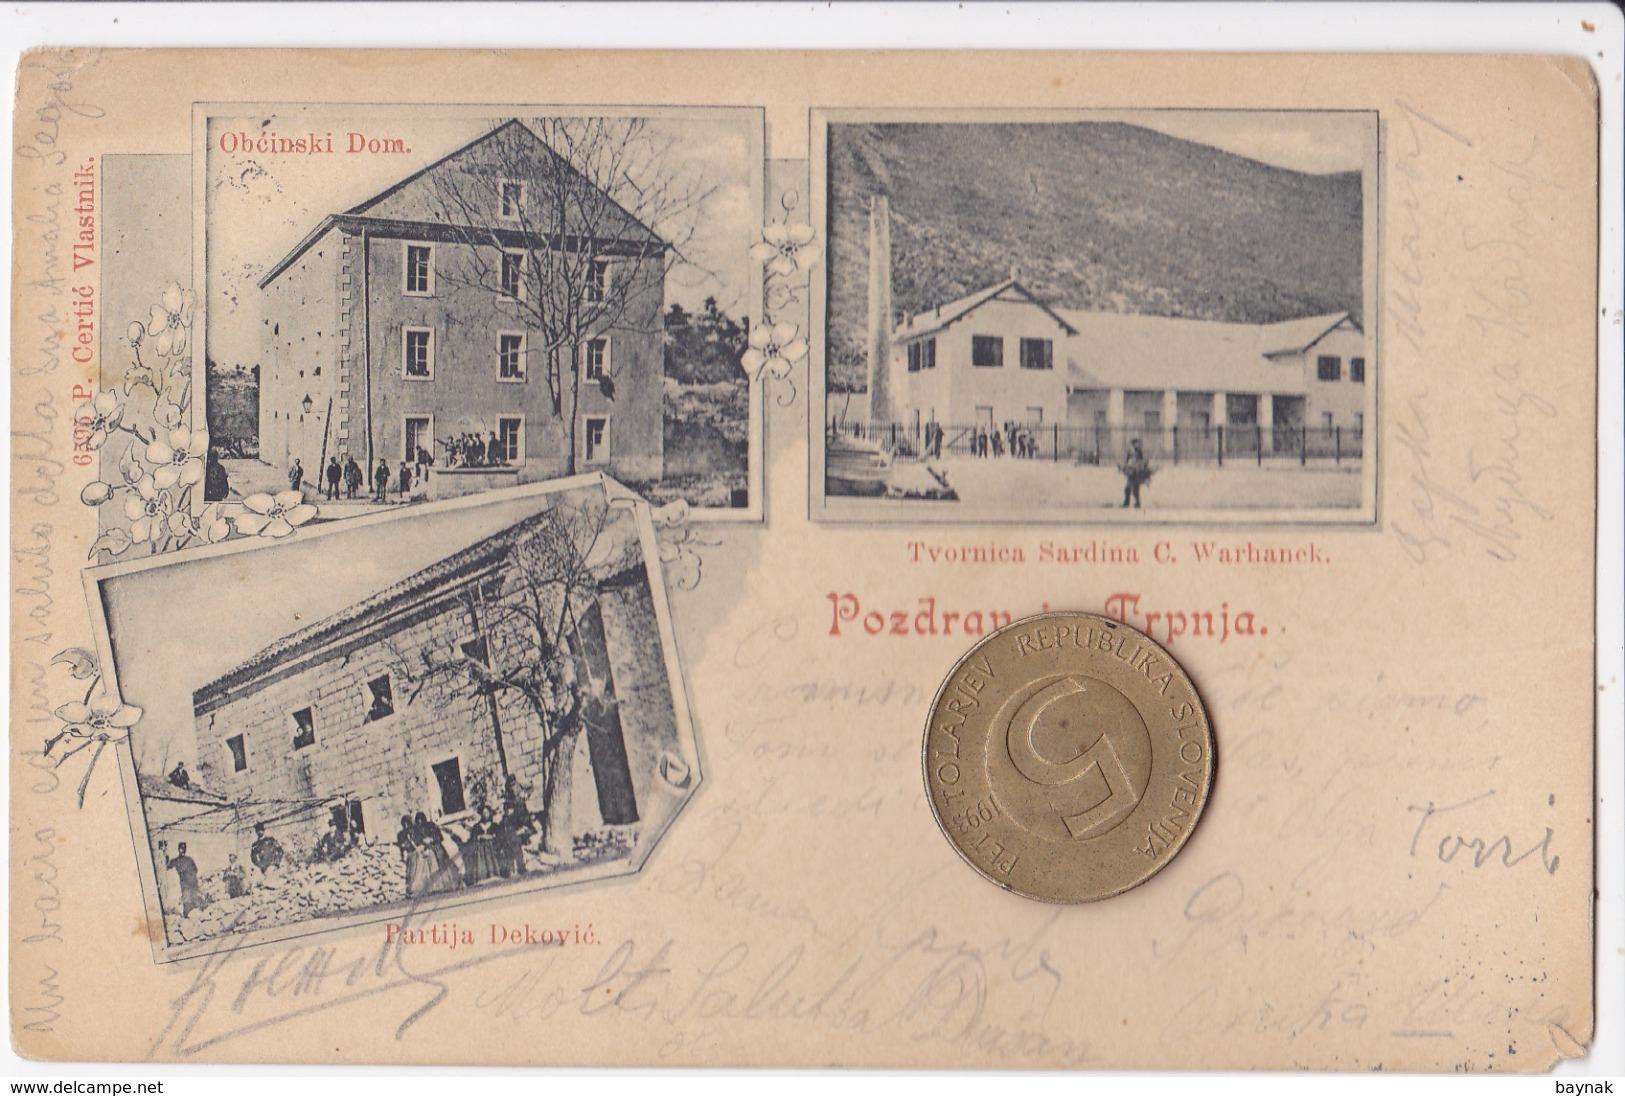 C423   --   POZDRAV IZ TRPANJ  -- 1903  --  TVORNICA SARDINA C. WARHANEK, BIRTIJA DEKOVIC, OBCINSKI DOM, SARDINEN FABRIK - Croatia